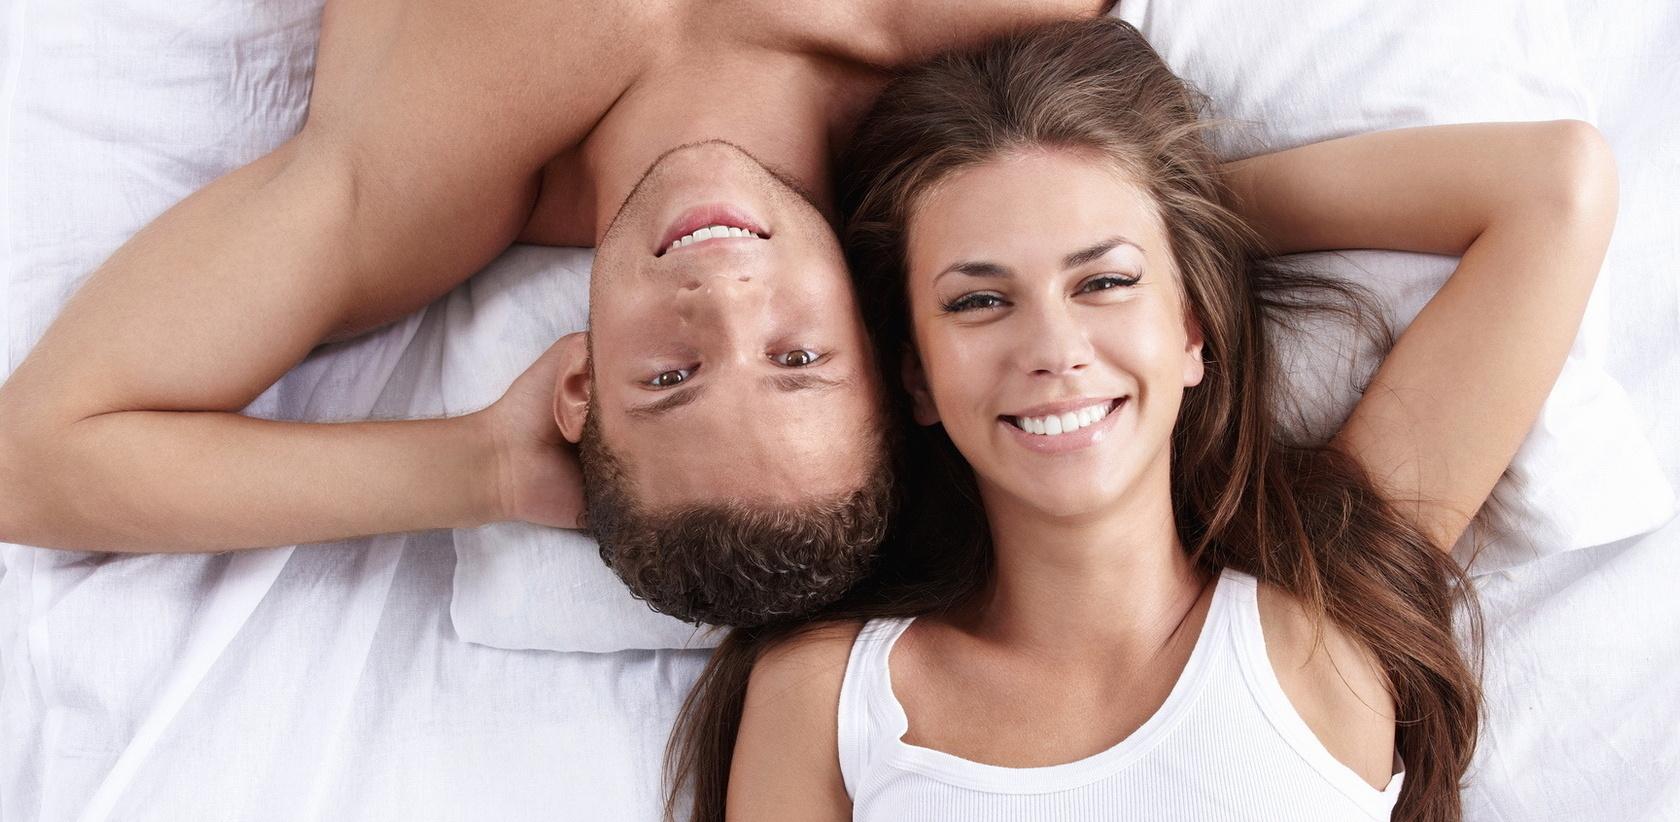 Смотреть секс после турнира — pic 3